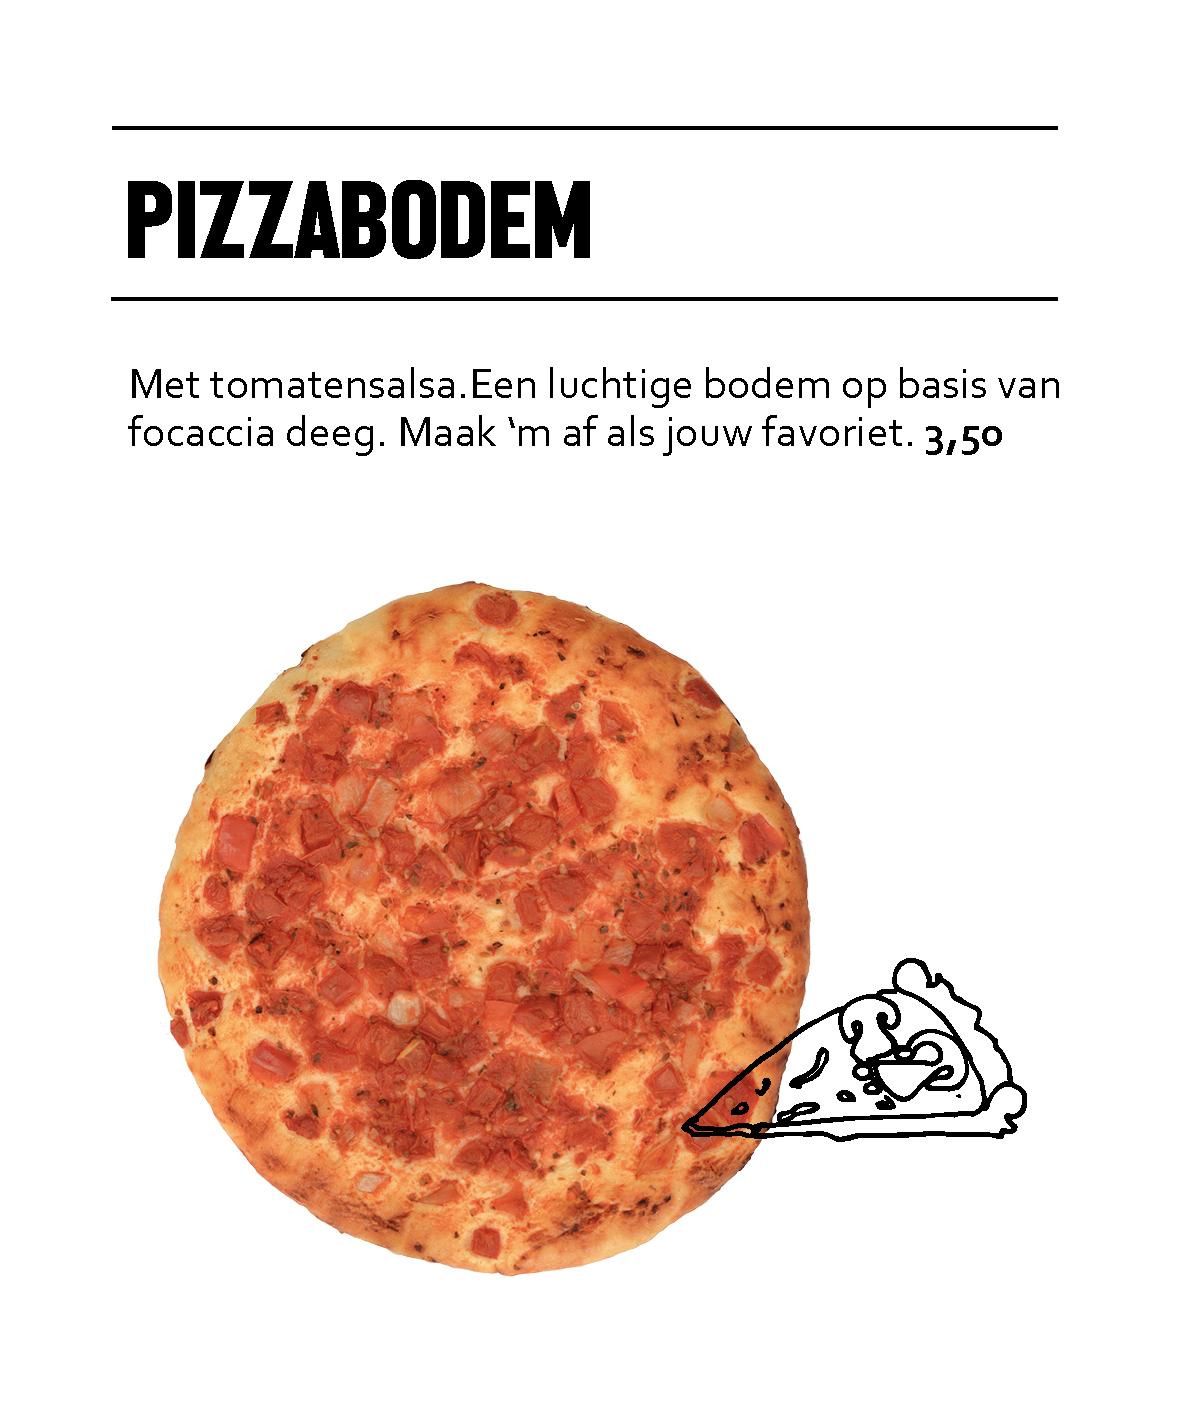 bakkerskeuken_product pizza.jpg